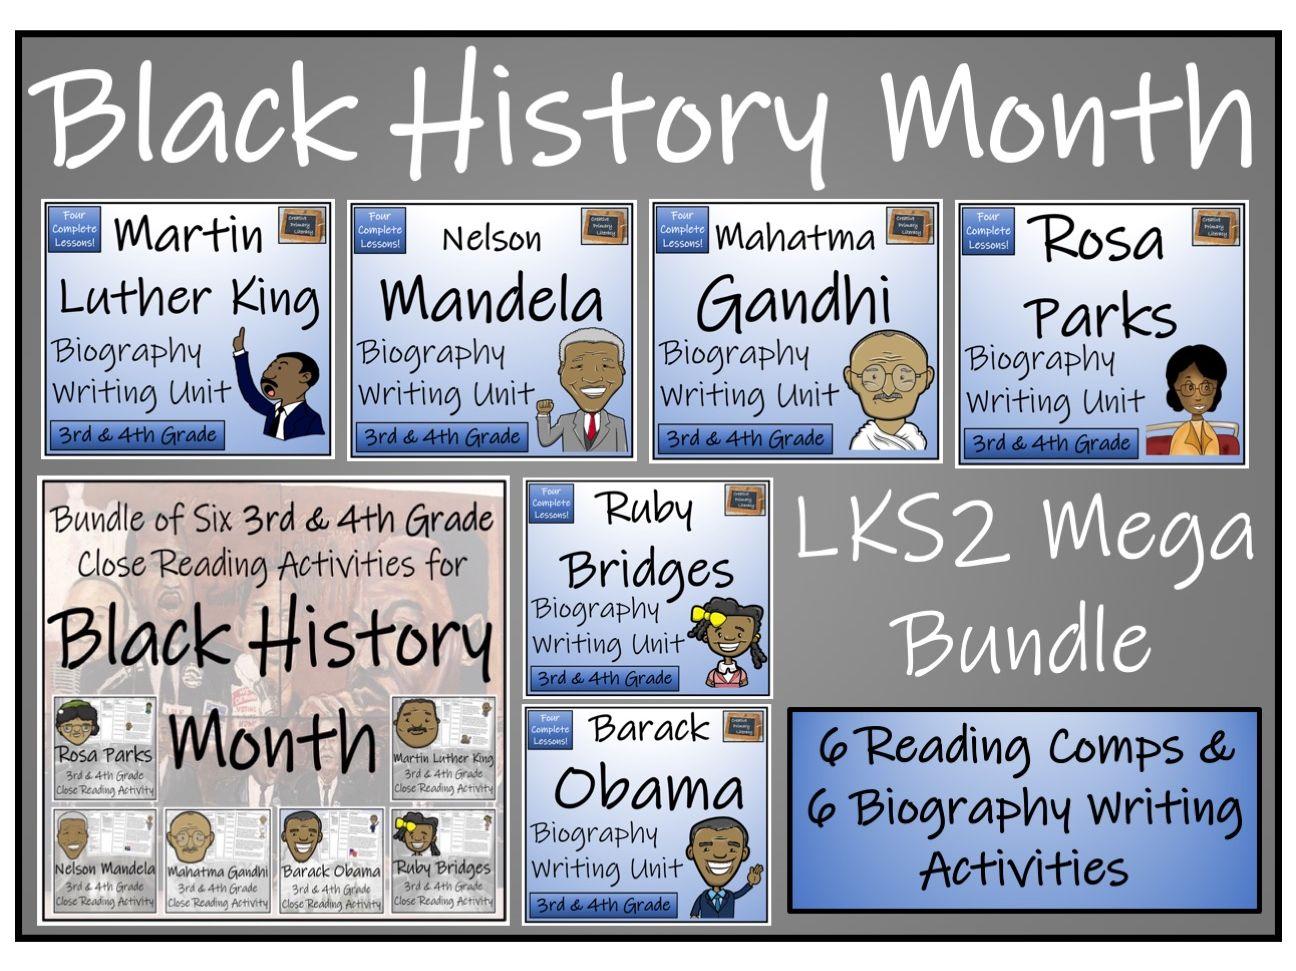 LKS2 Black History Month Reading Comprehension & Writing Bundle